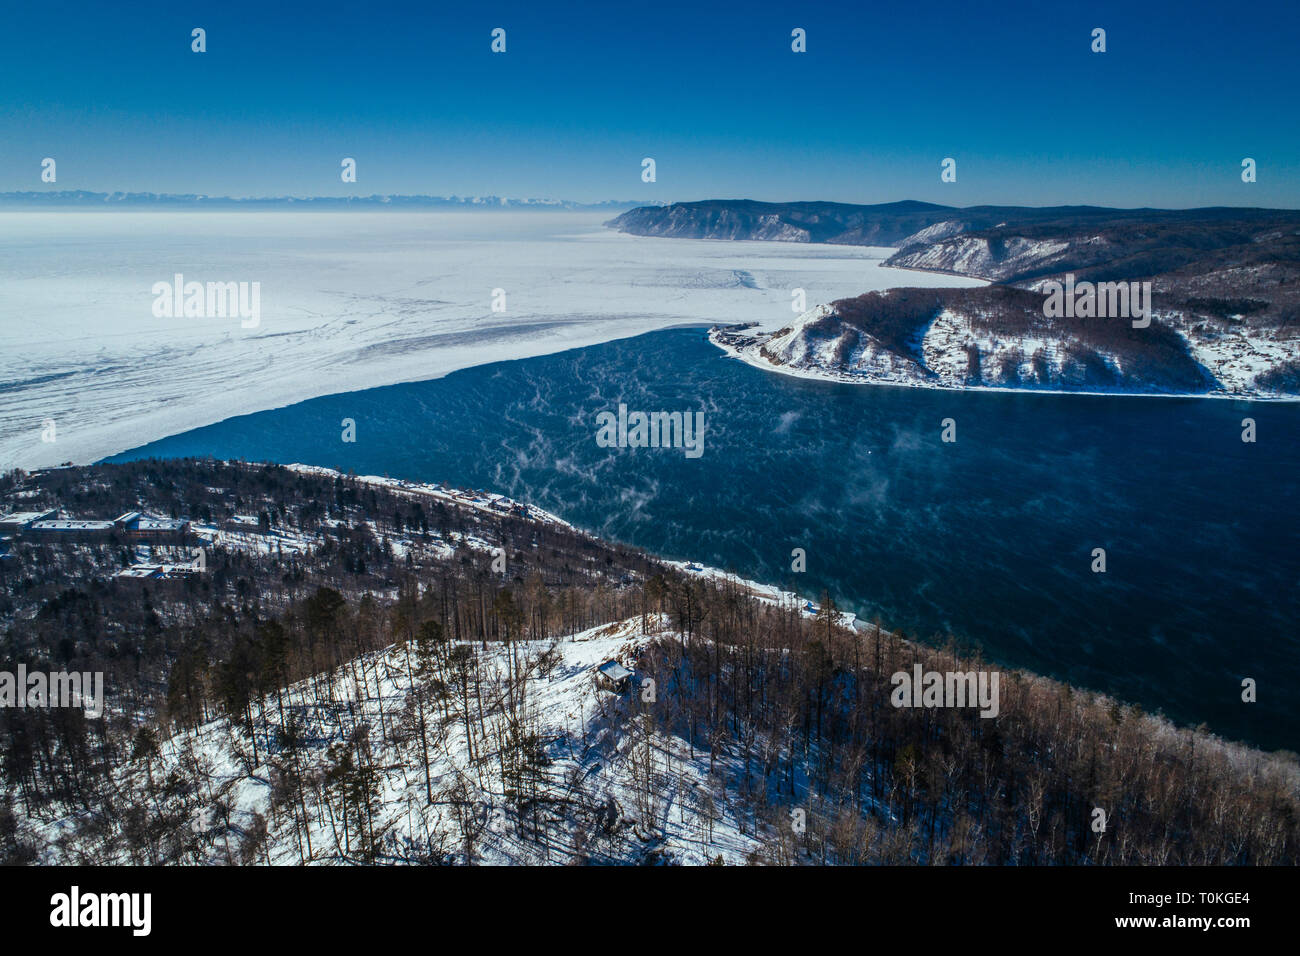 Lake Baikal in Winter, Russia Stock Photo